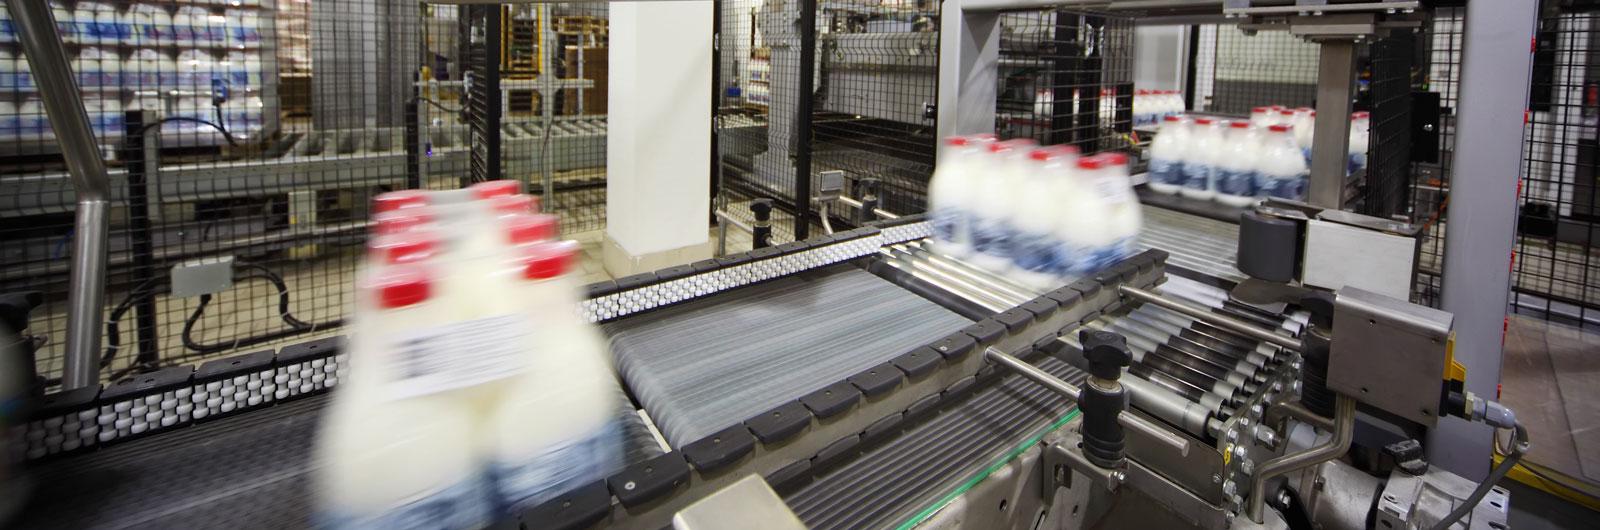 manufacturing environment needing earplugs